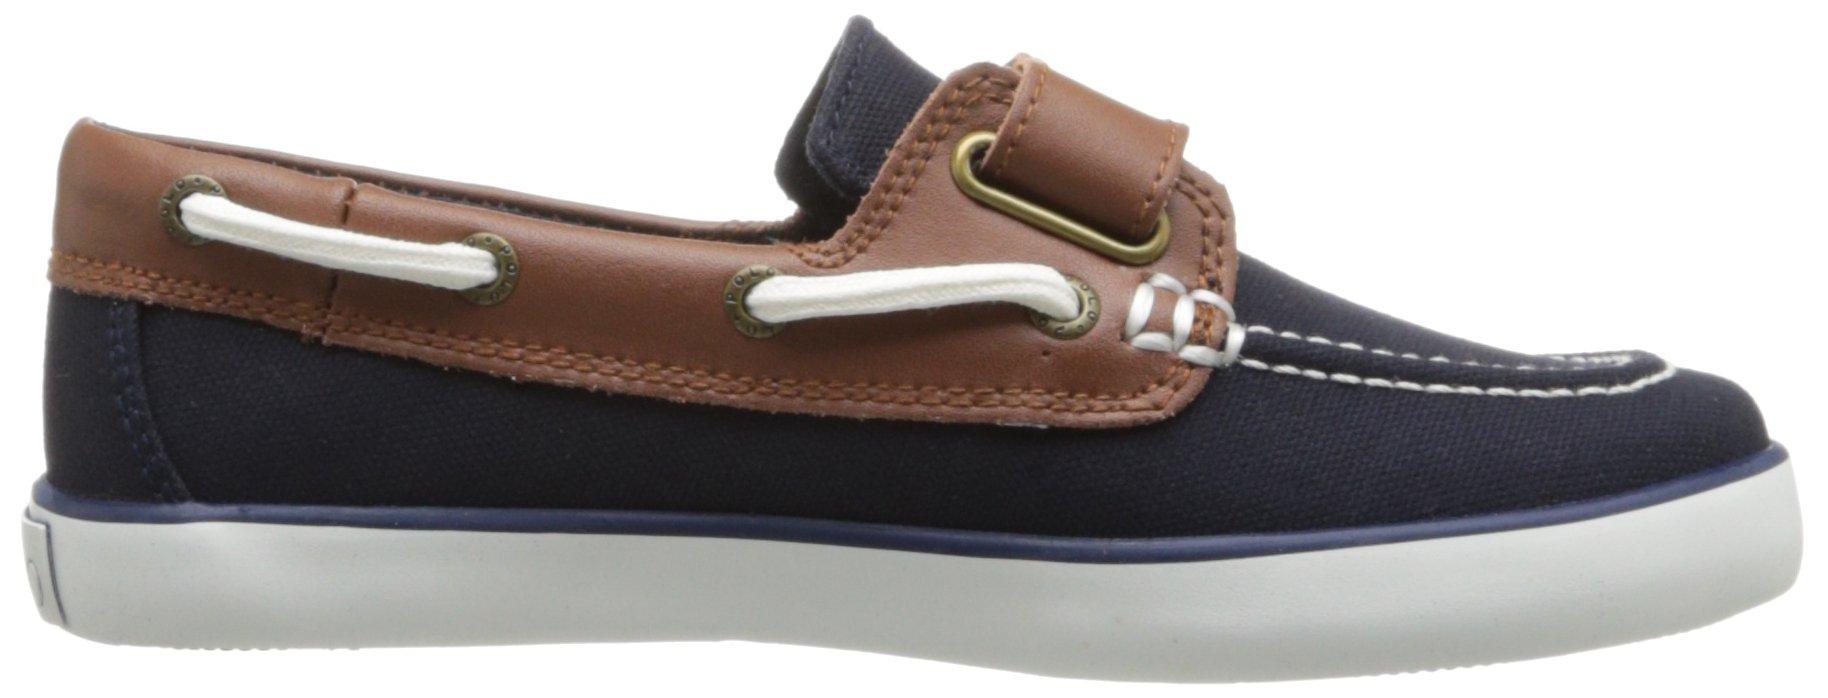 Polo Ralph Lauren Kids Sander-CL EZ Sneaker ,Navy,10.5 M US Little Kid by Polo Ralph Lauren (Image #6)